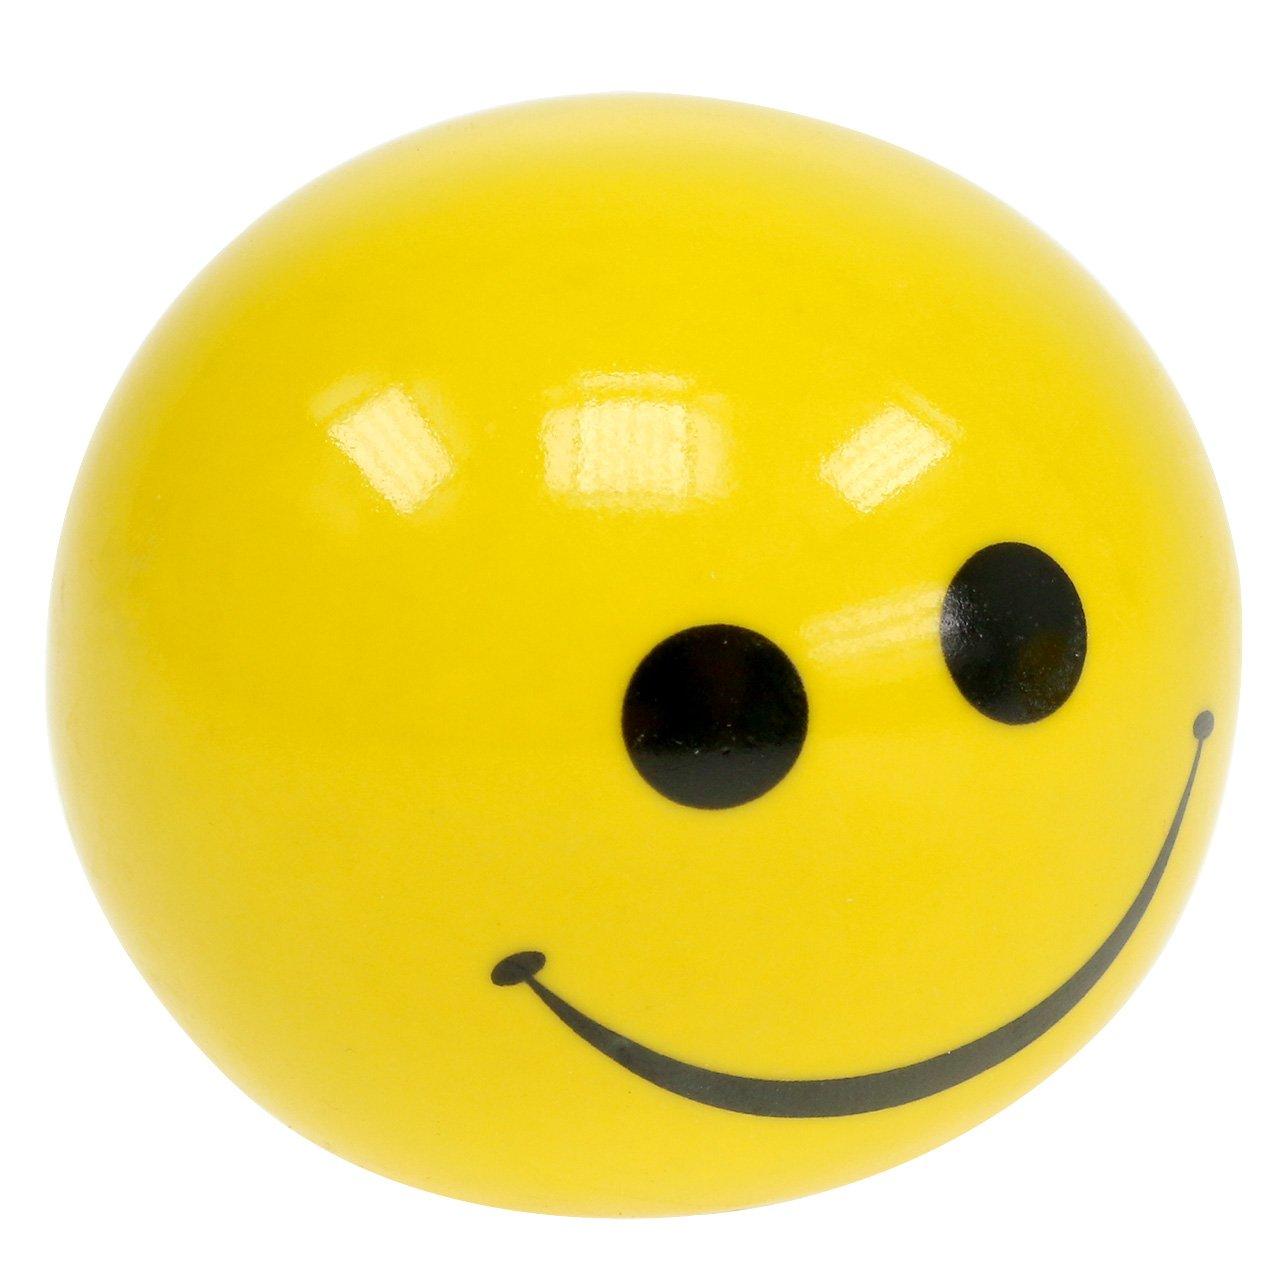 Keramisk kugle med Smeili gul Ø5cm H4,5cm 6stk